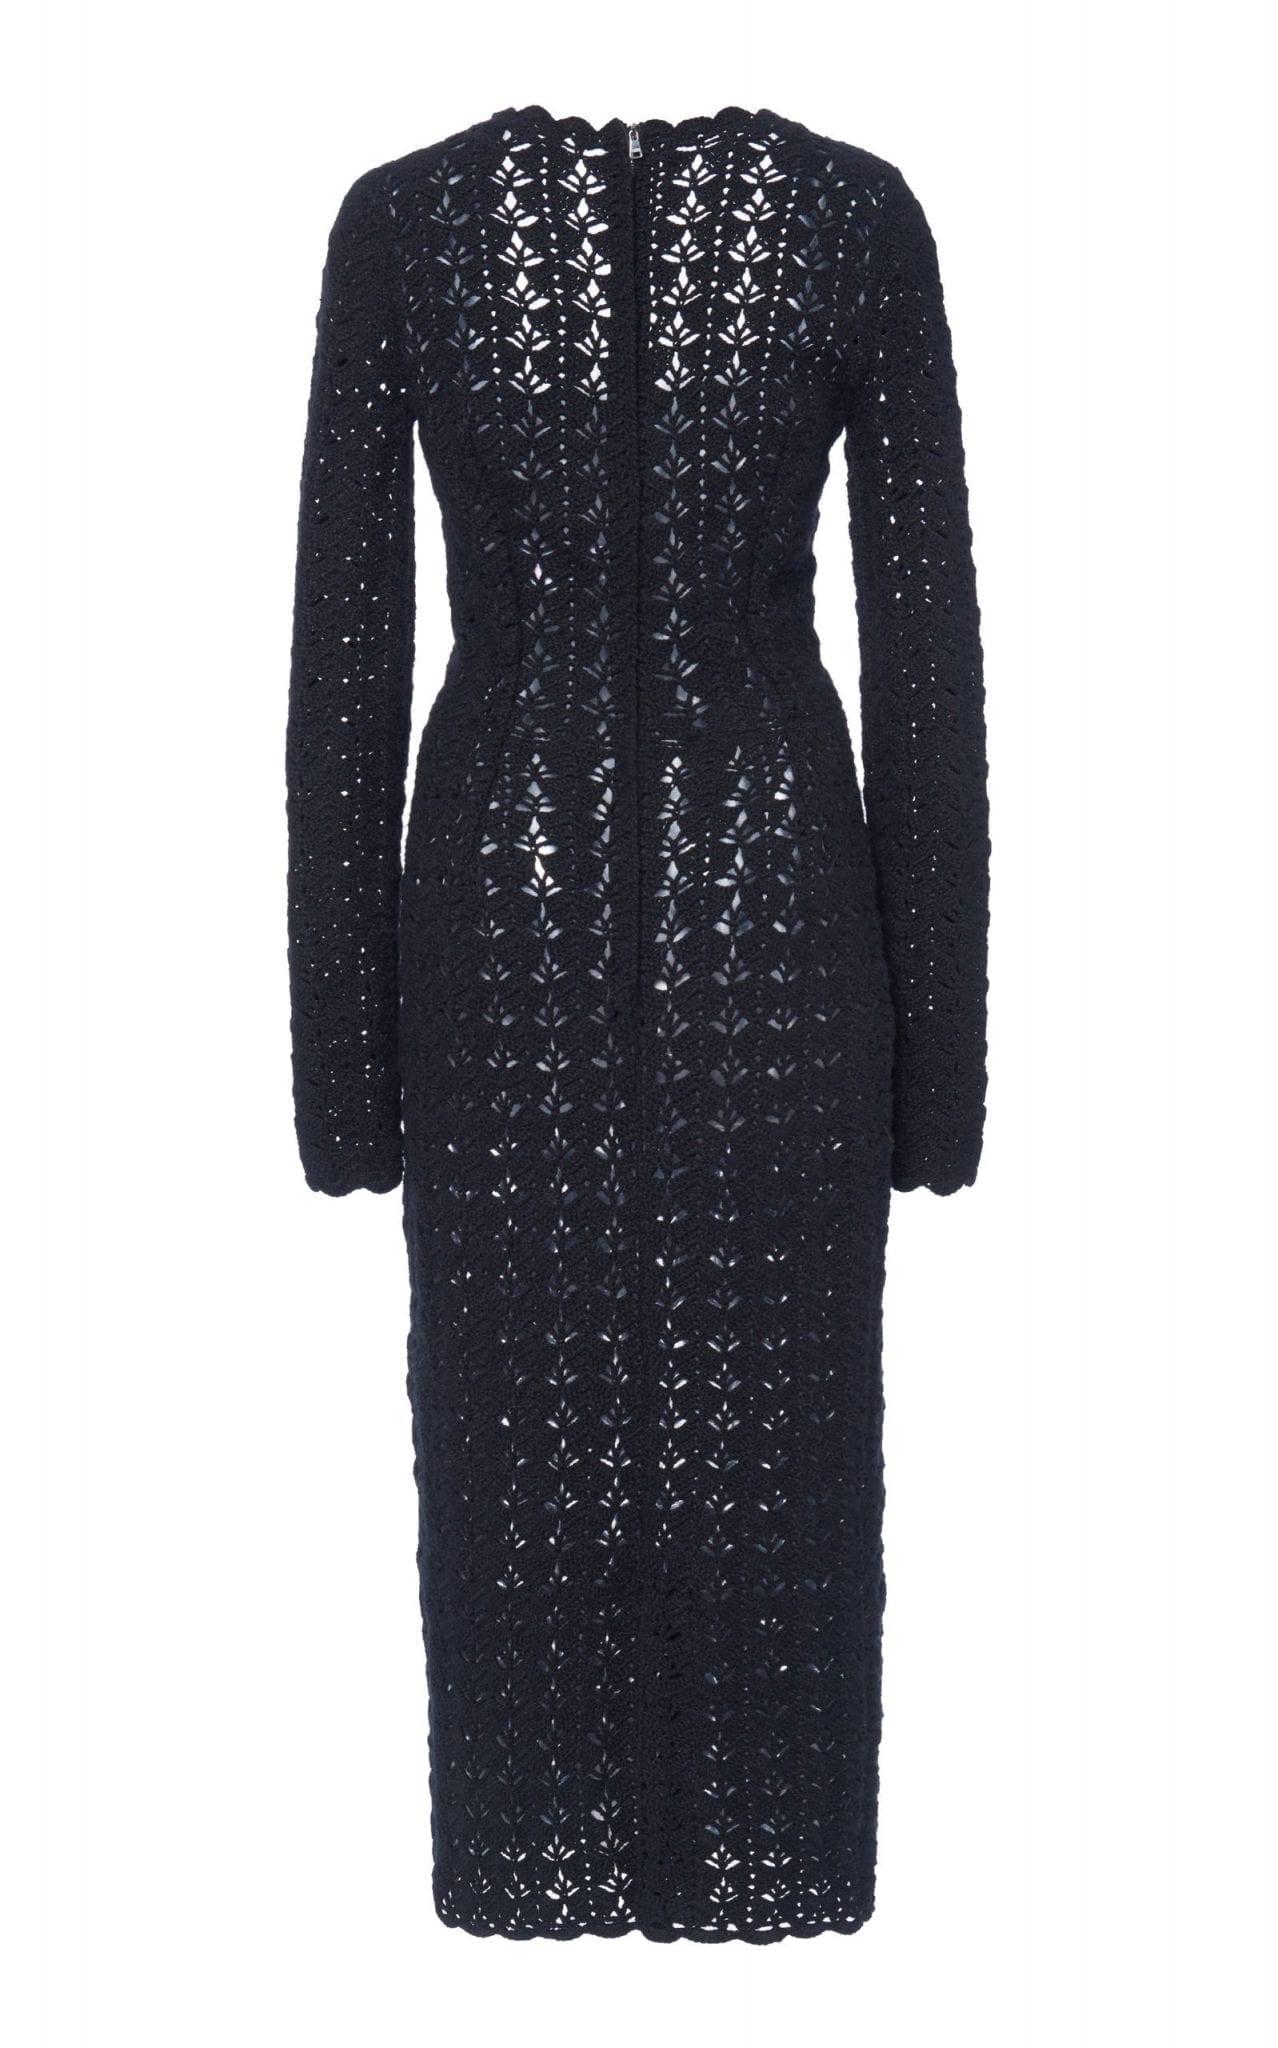 DOLCE & GABBANA Open-Knit Midi Dress